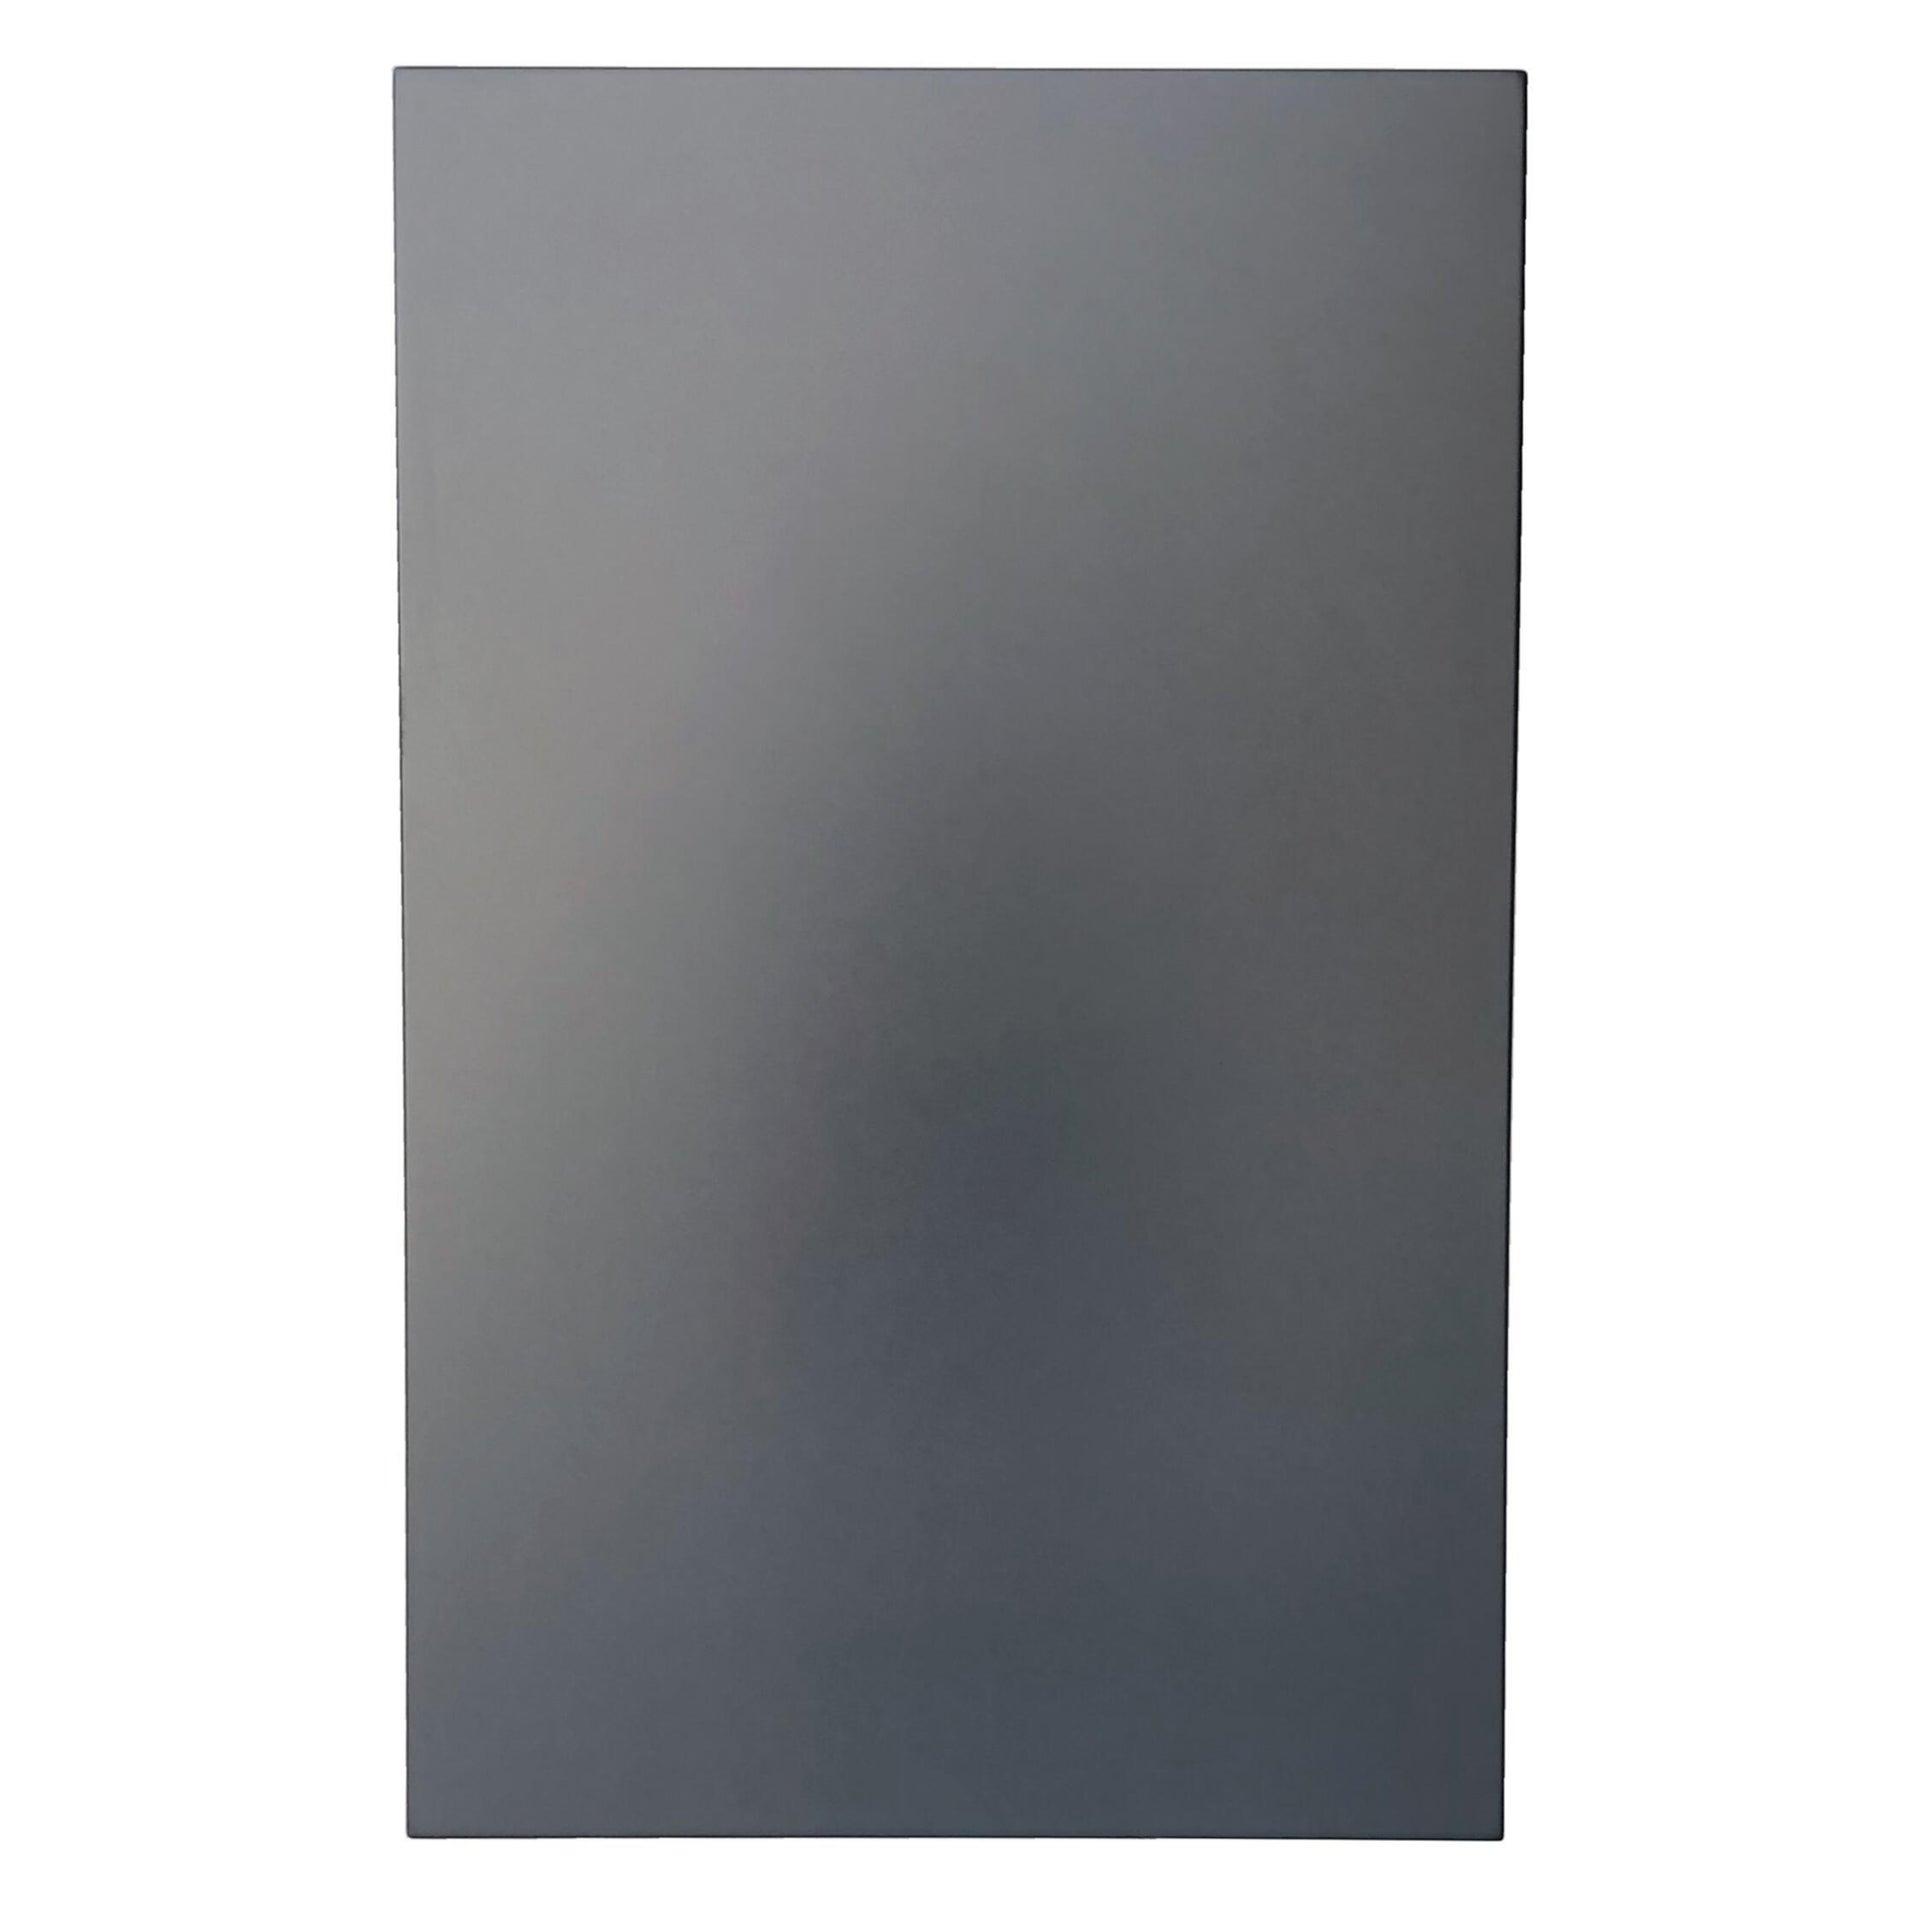 Anta DELINIA ID Parigi 76.5 x 59.7 blu